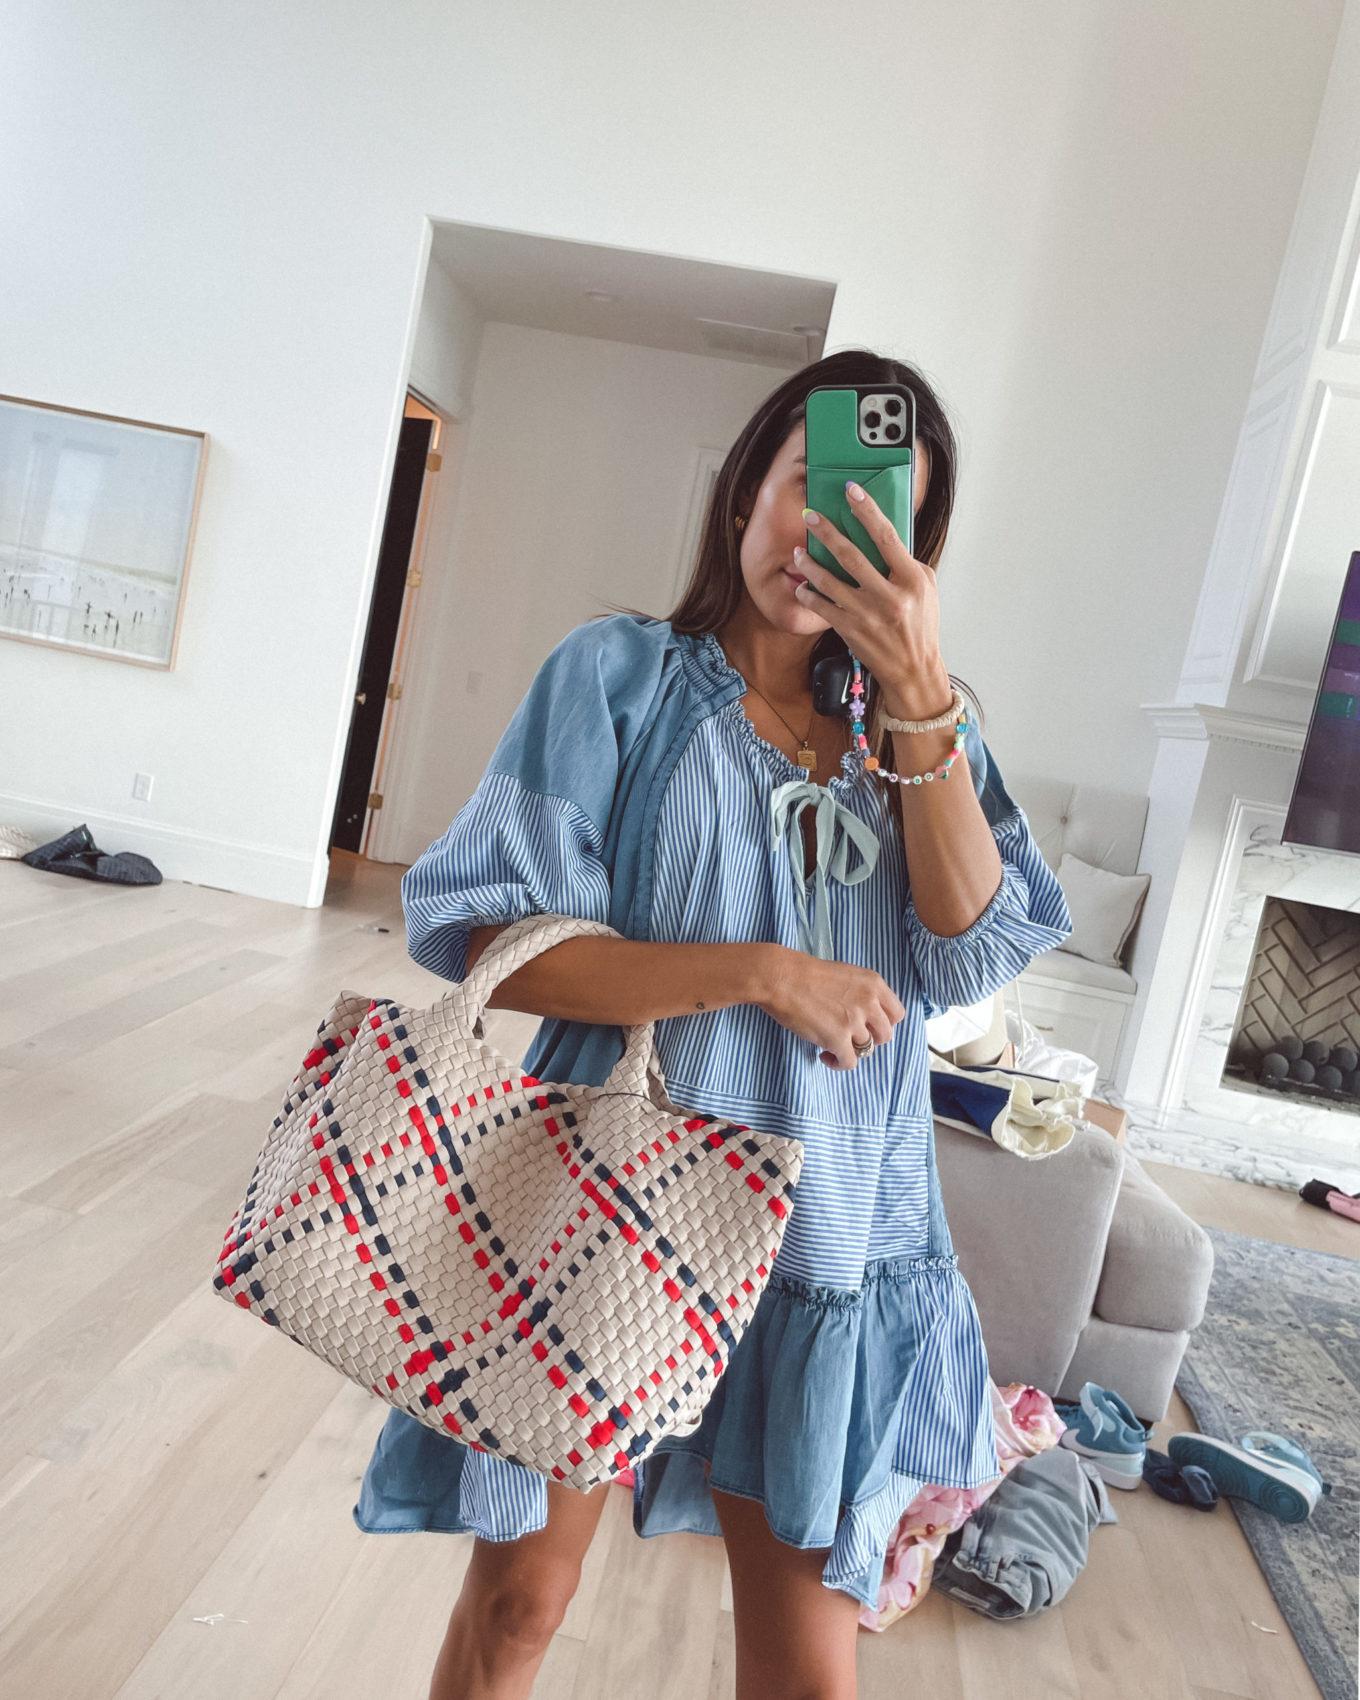 4th of July, dress, tote bag